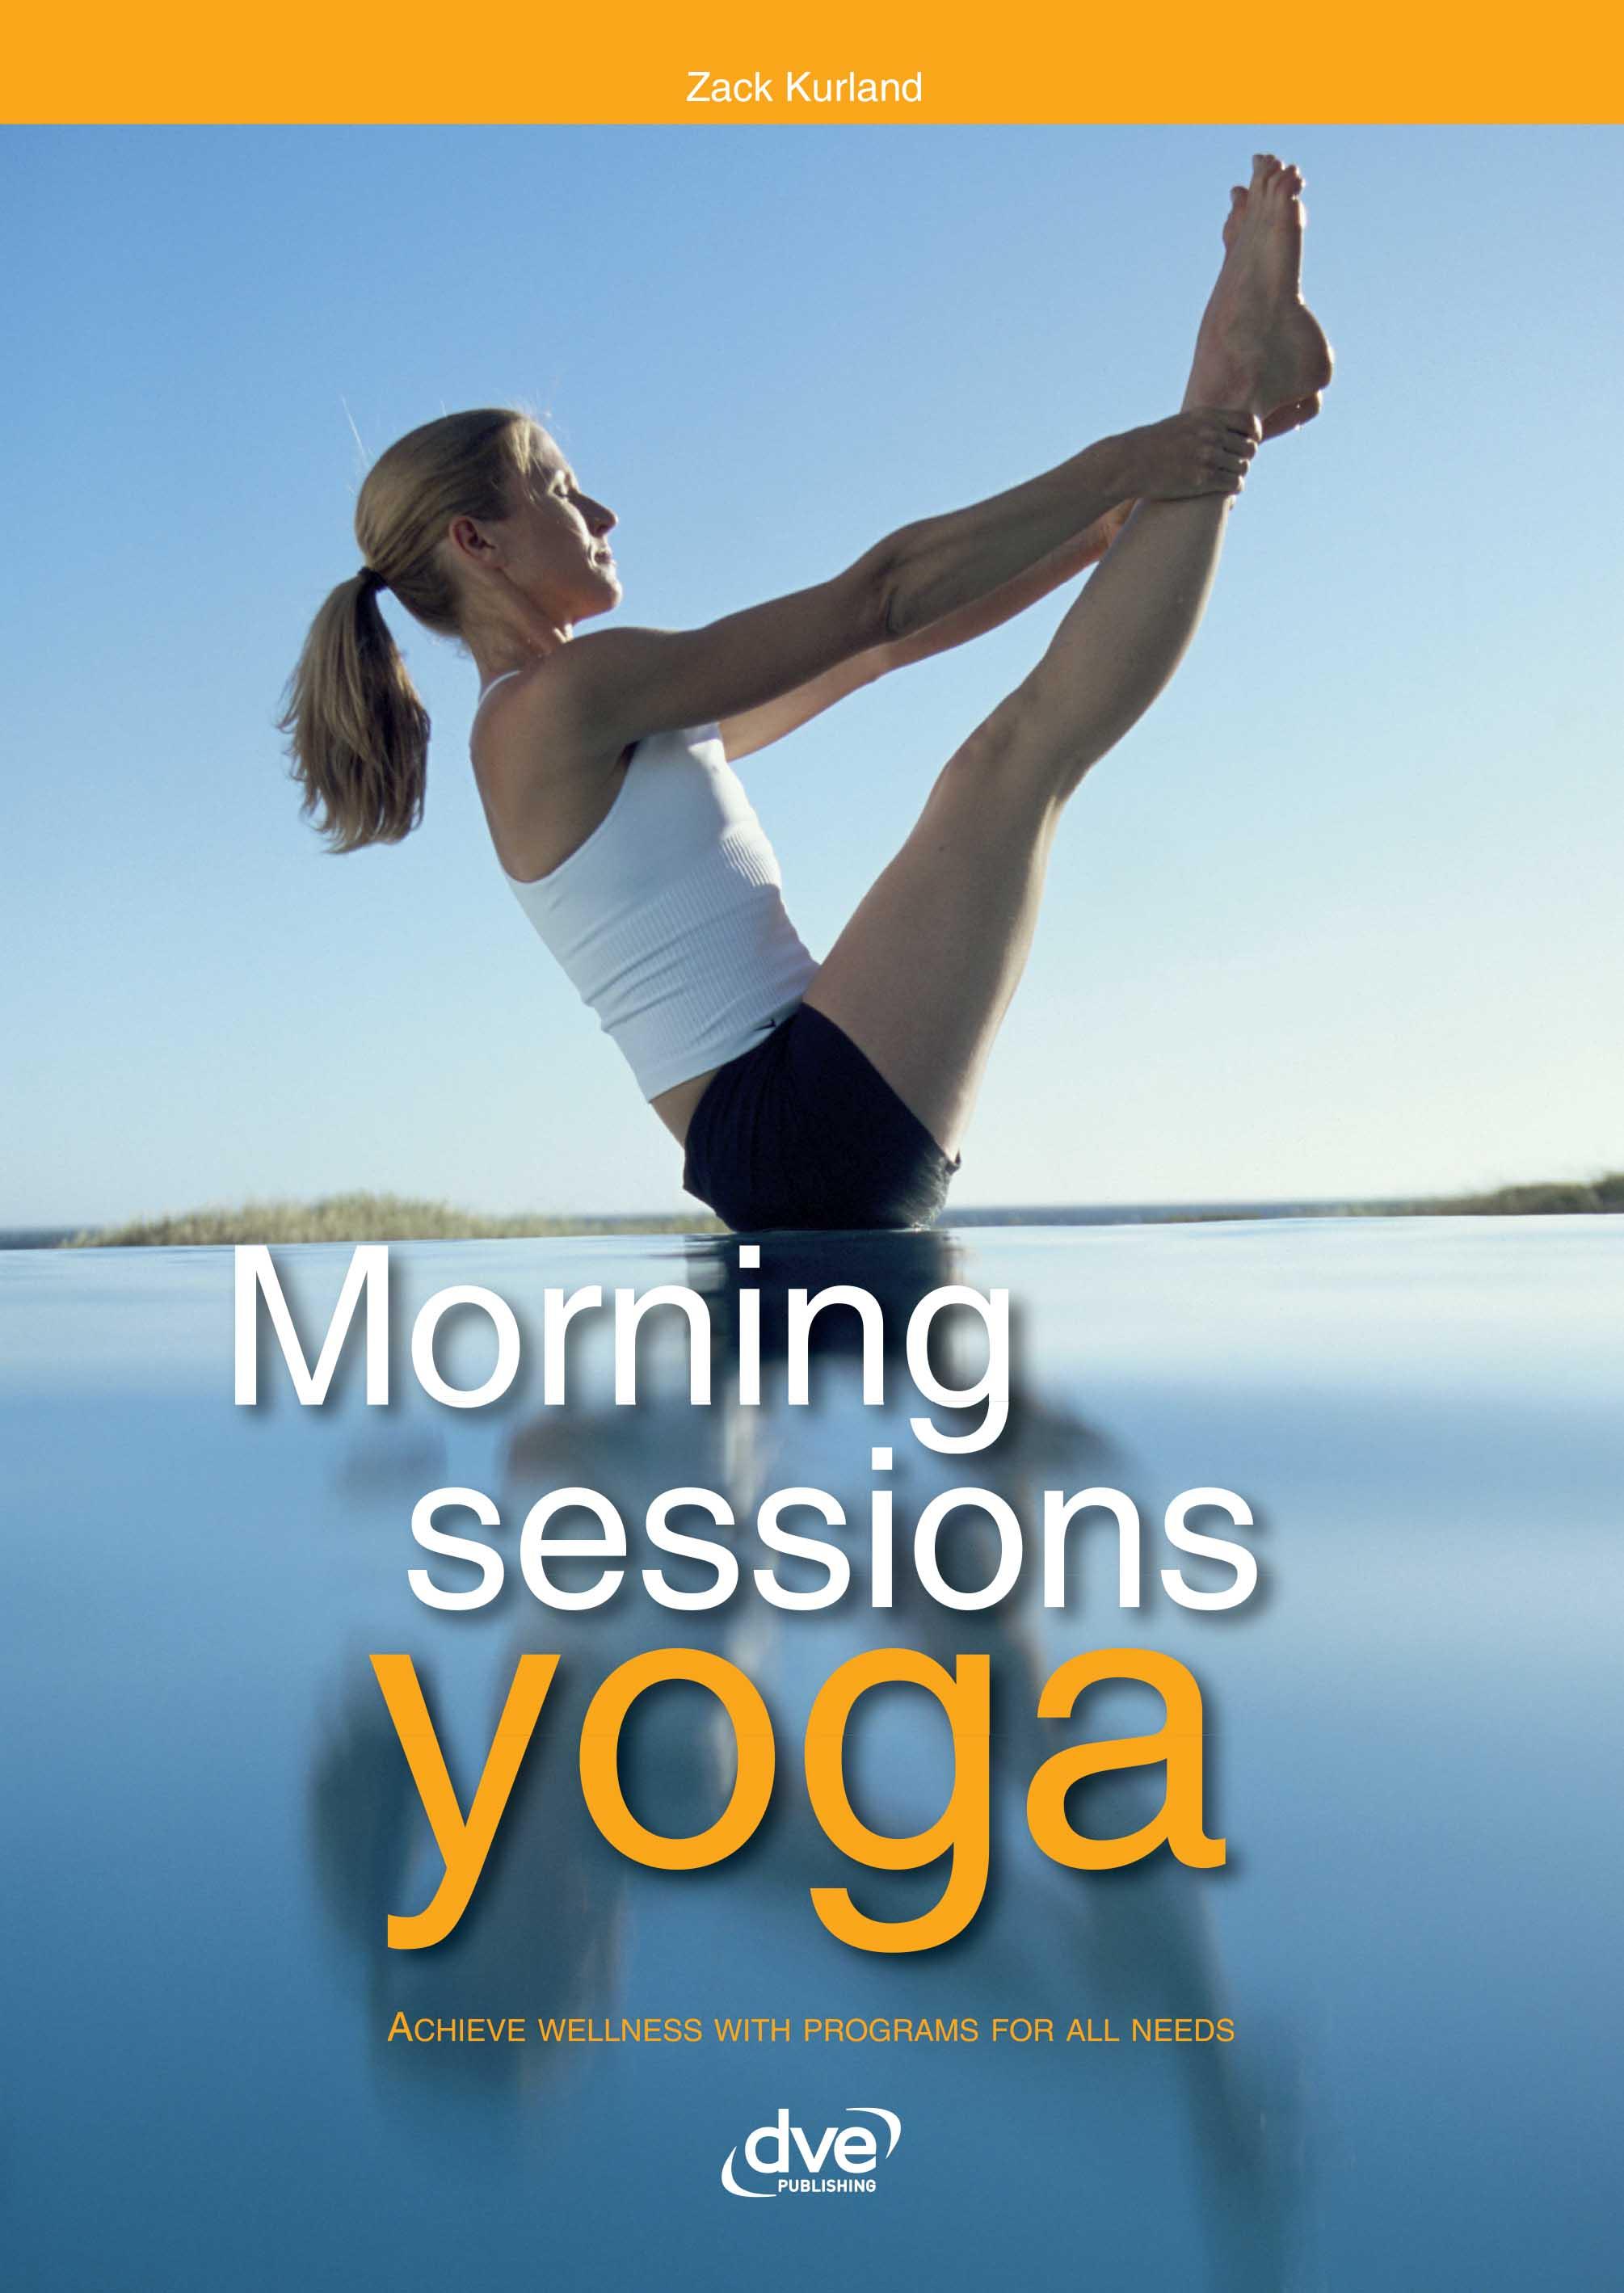 Morning sessions yoga